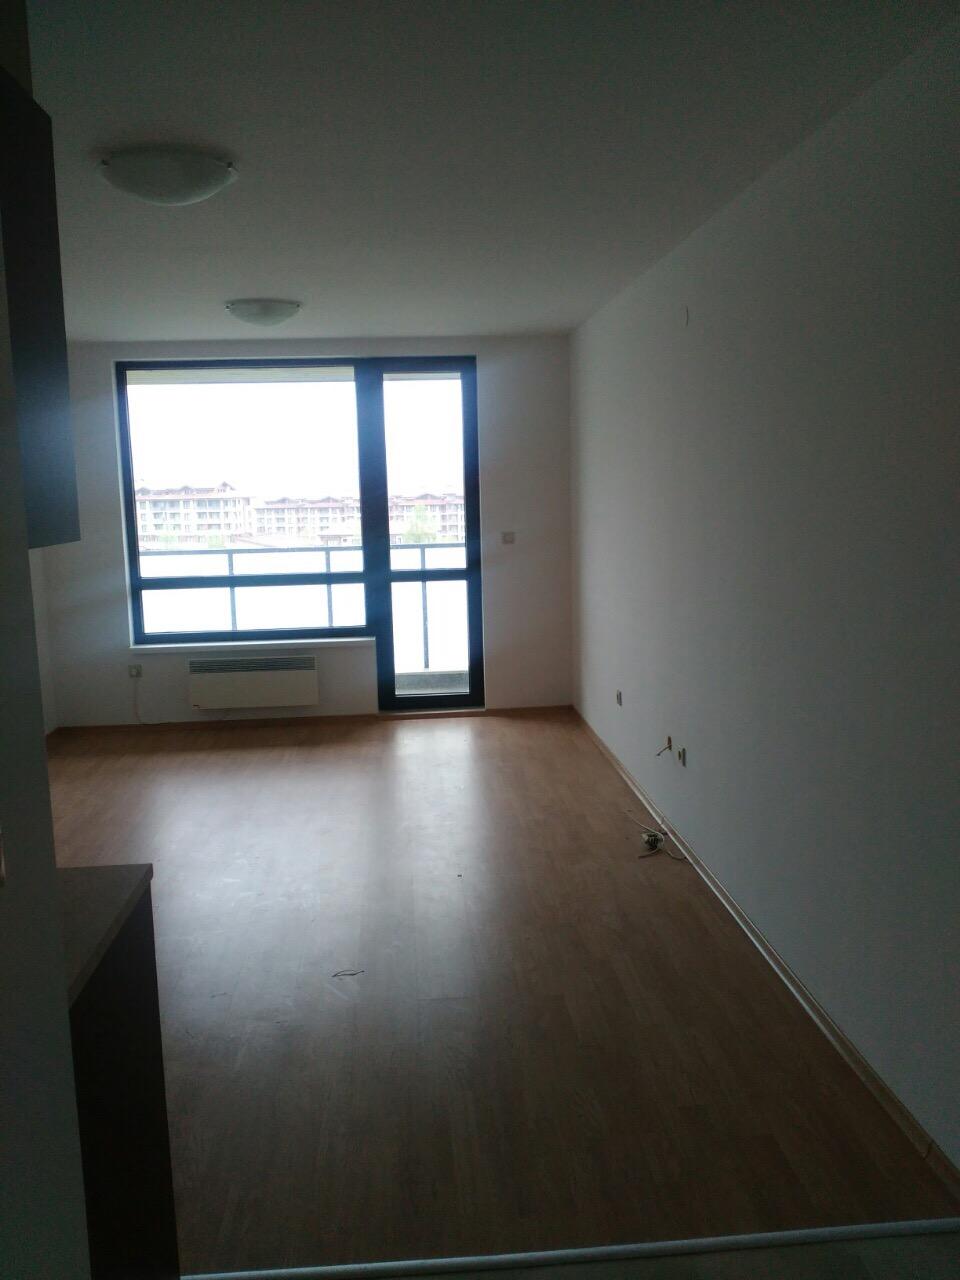 1539859567-sell-property-img_2352.JPG